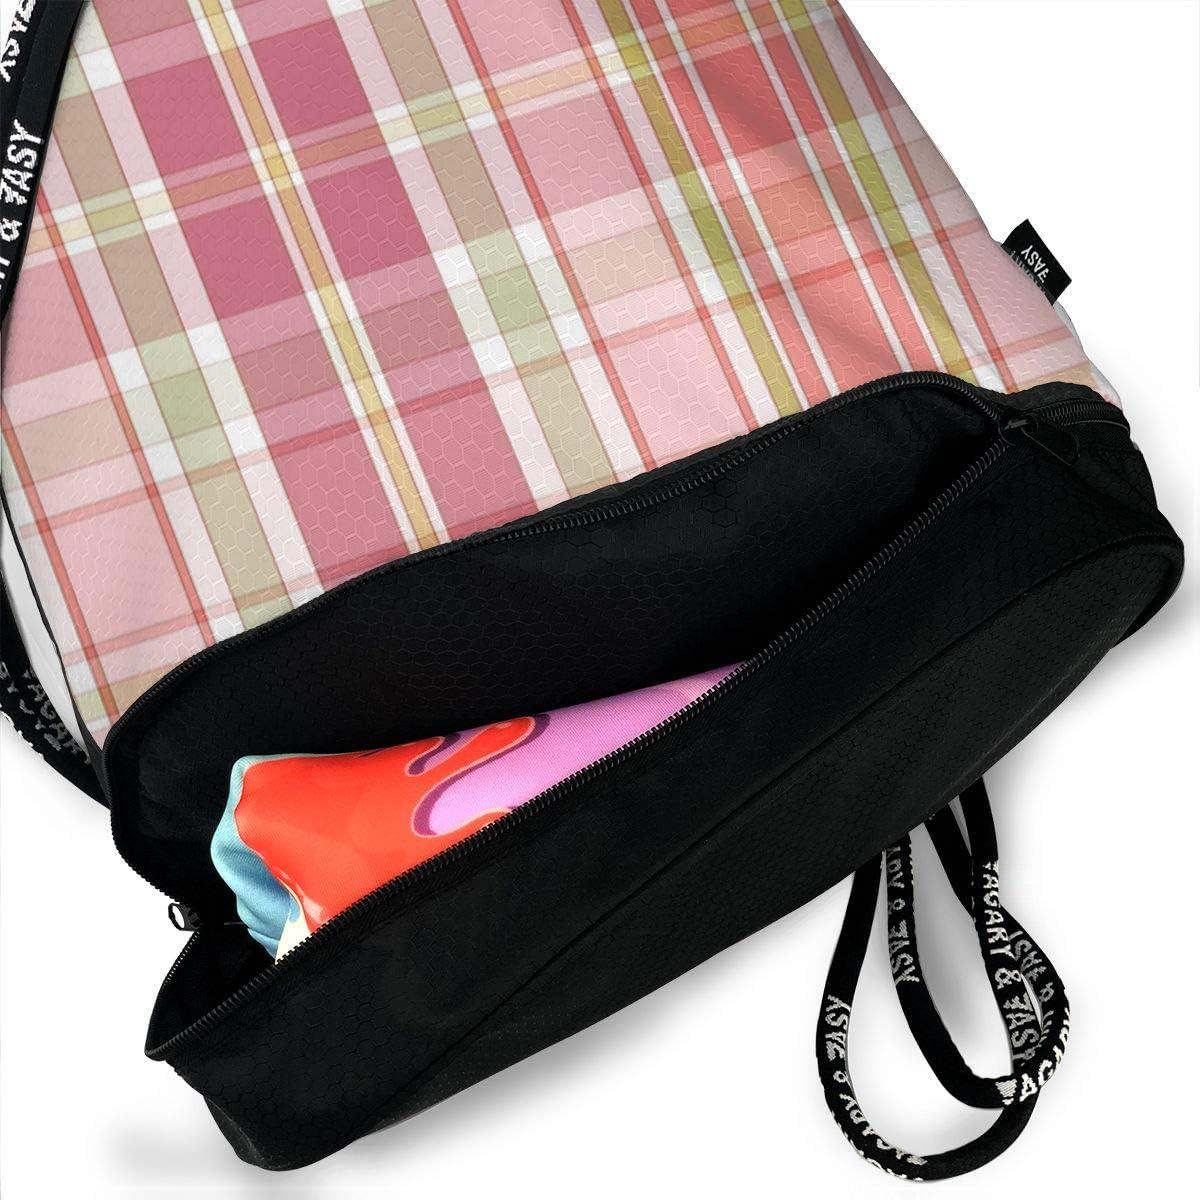 Multi Plaid Drawstring Backpack Sports Athletic Gym Cinch Sack String Storage Bags for Hiking Travel Beach